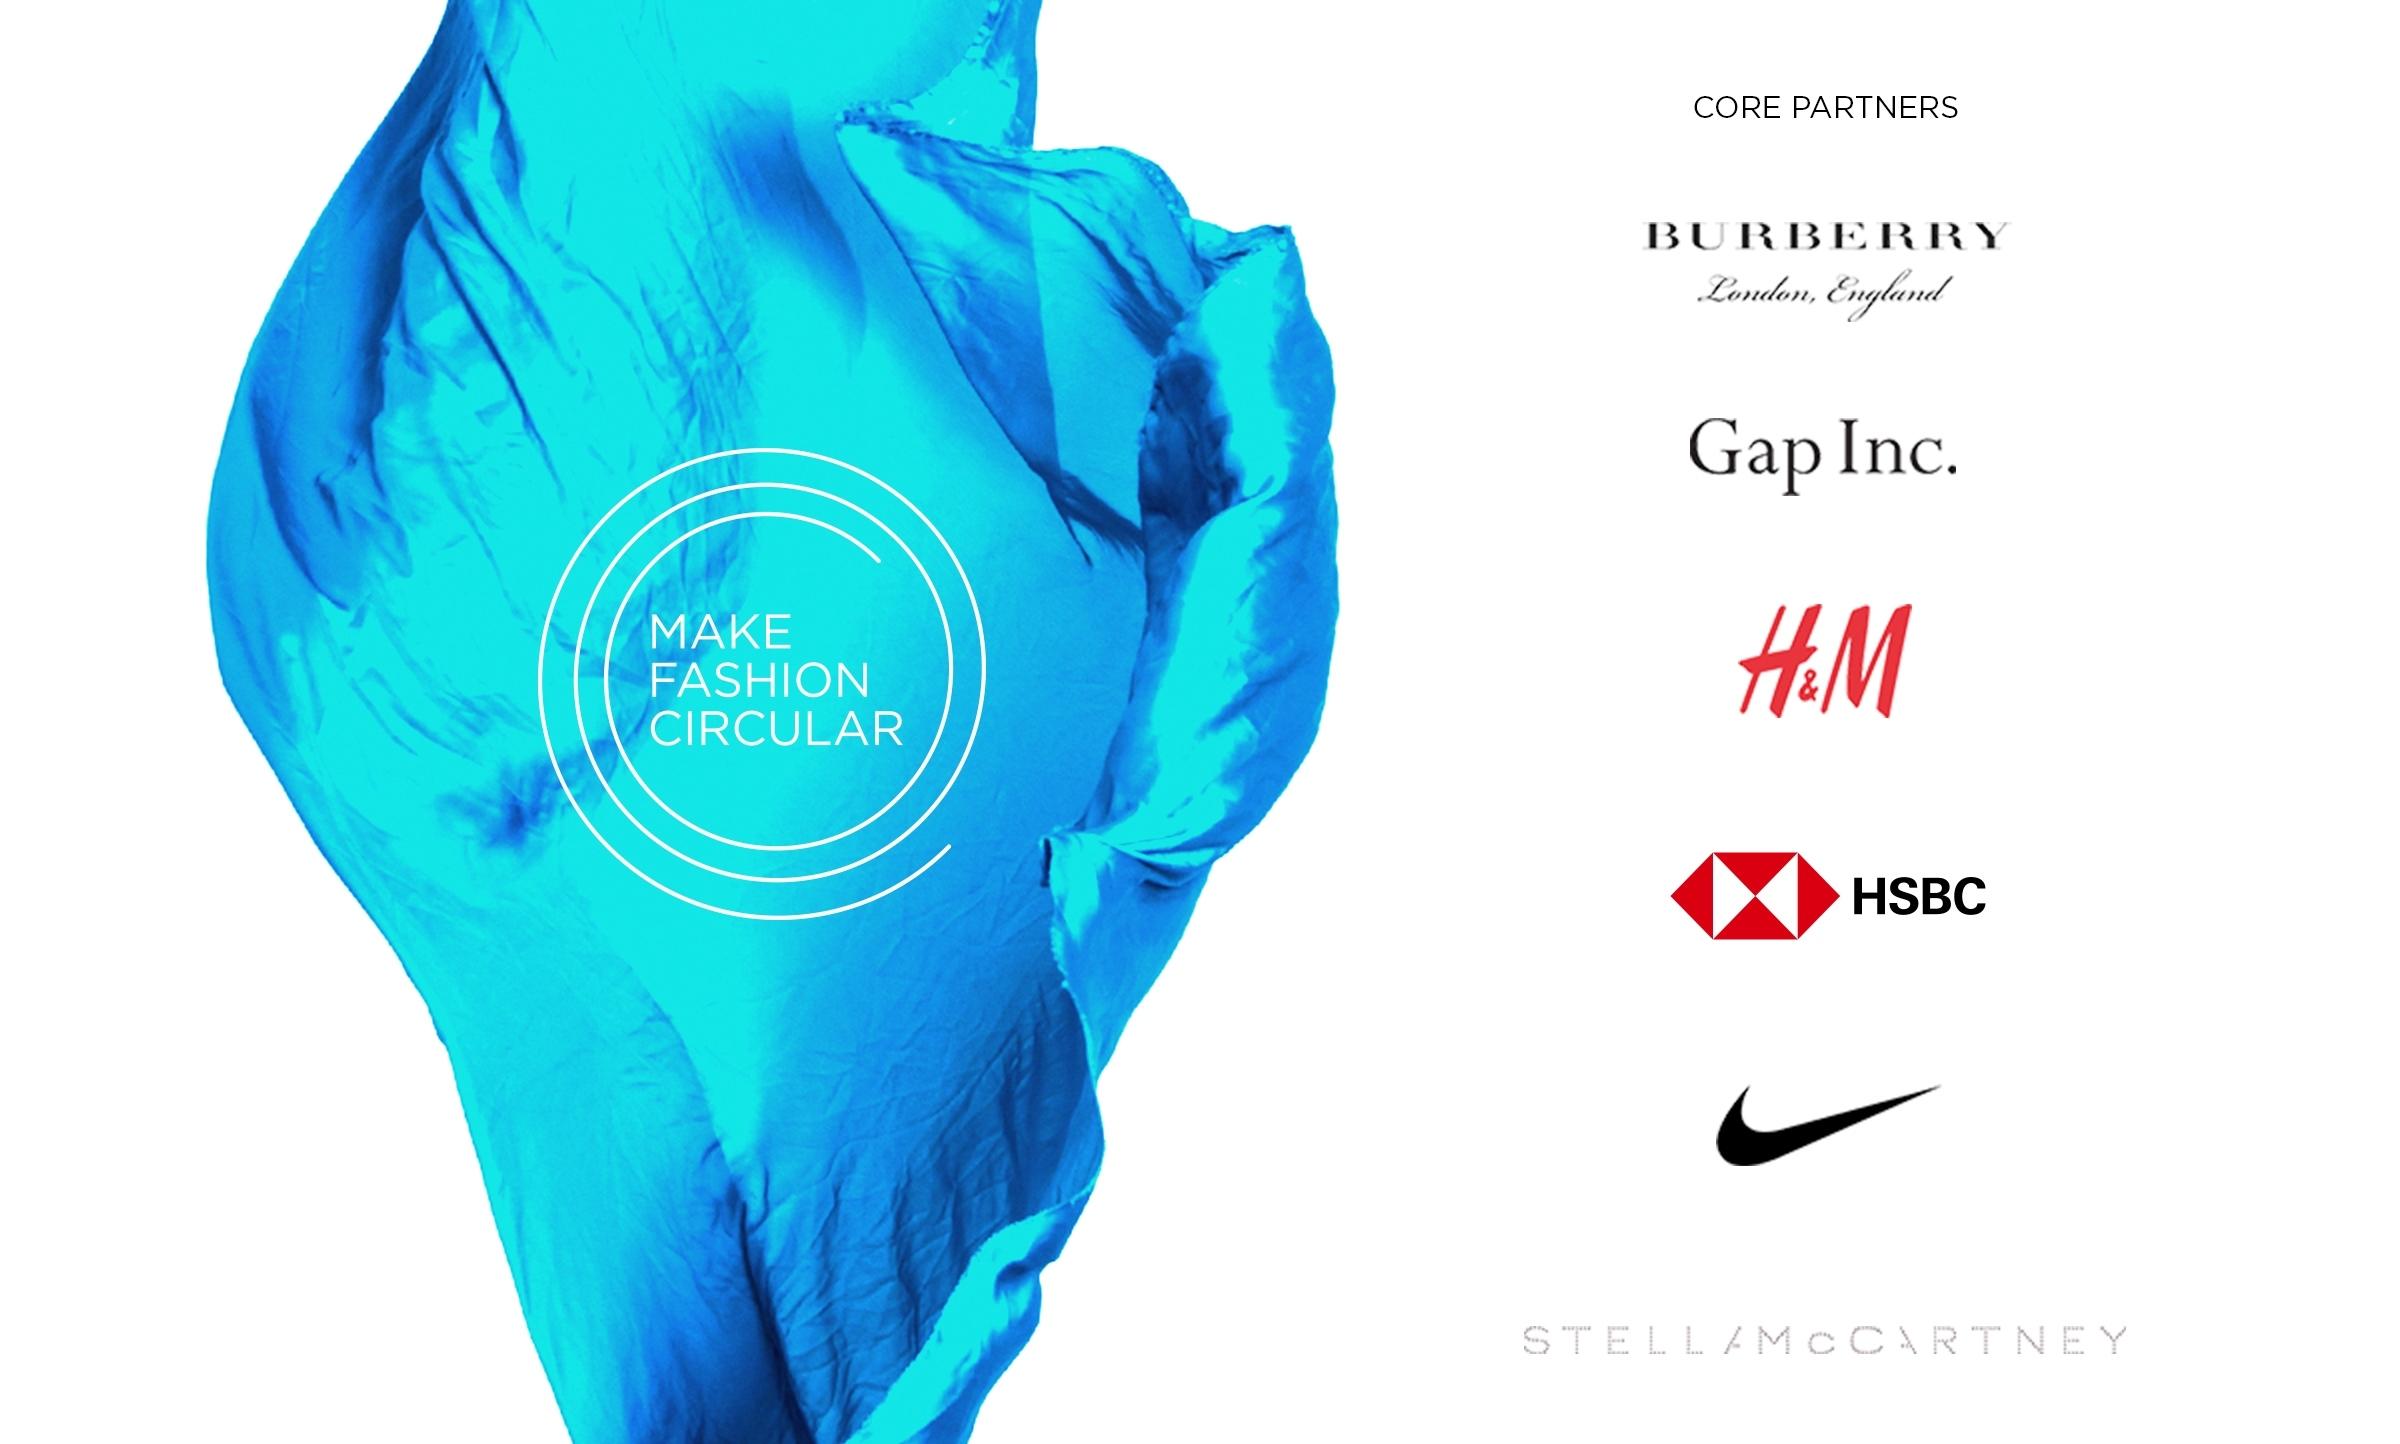 这些品牌签署时尚环保倡议:Make Fashion Circular(图1)